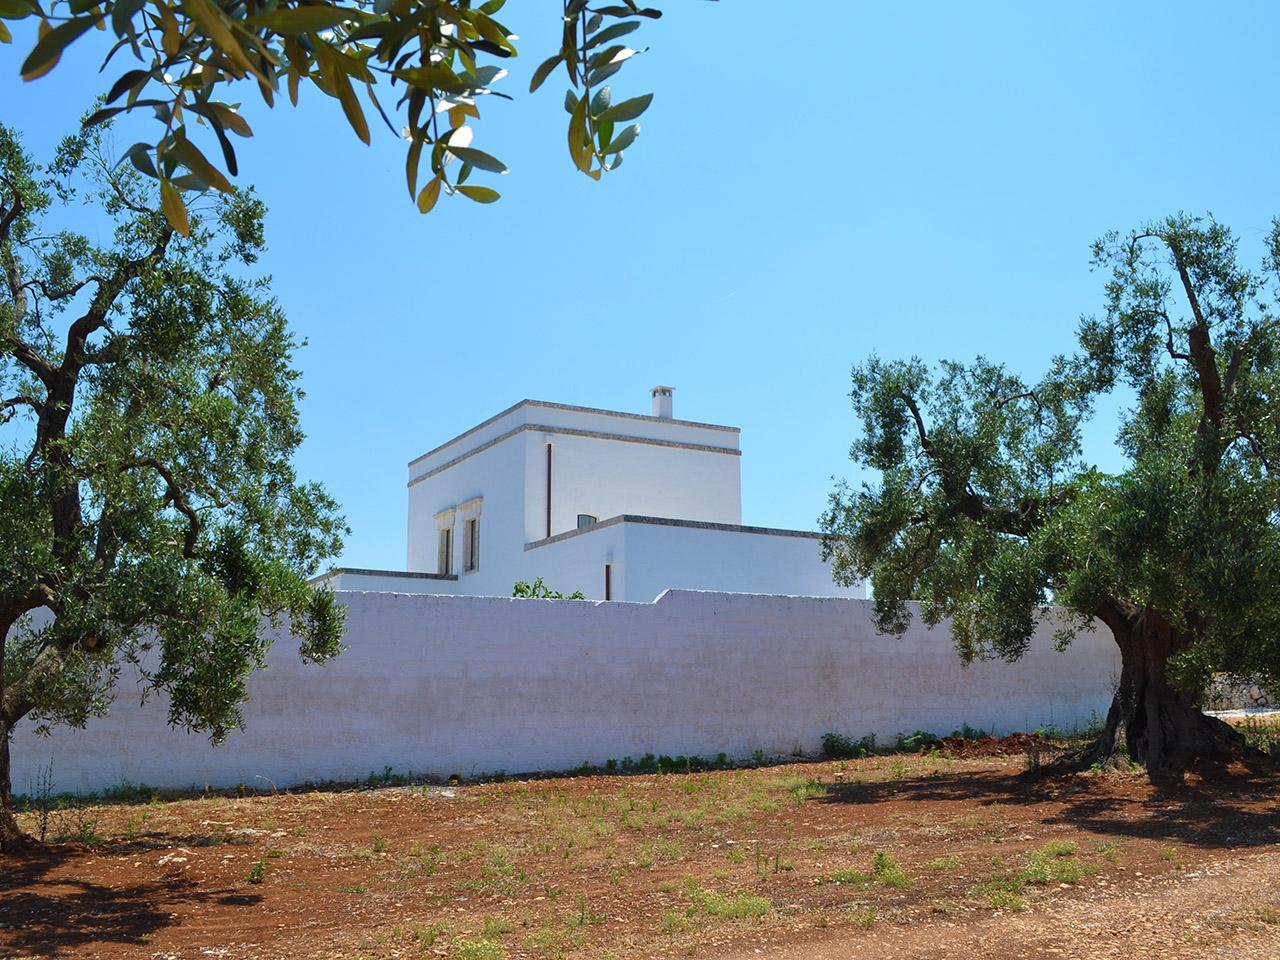 costruzioni restauri sirio ostuni restauro ristrutturazione masseria olive nardo ostuni dsc 5150